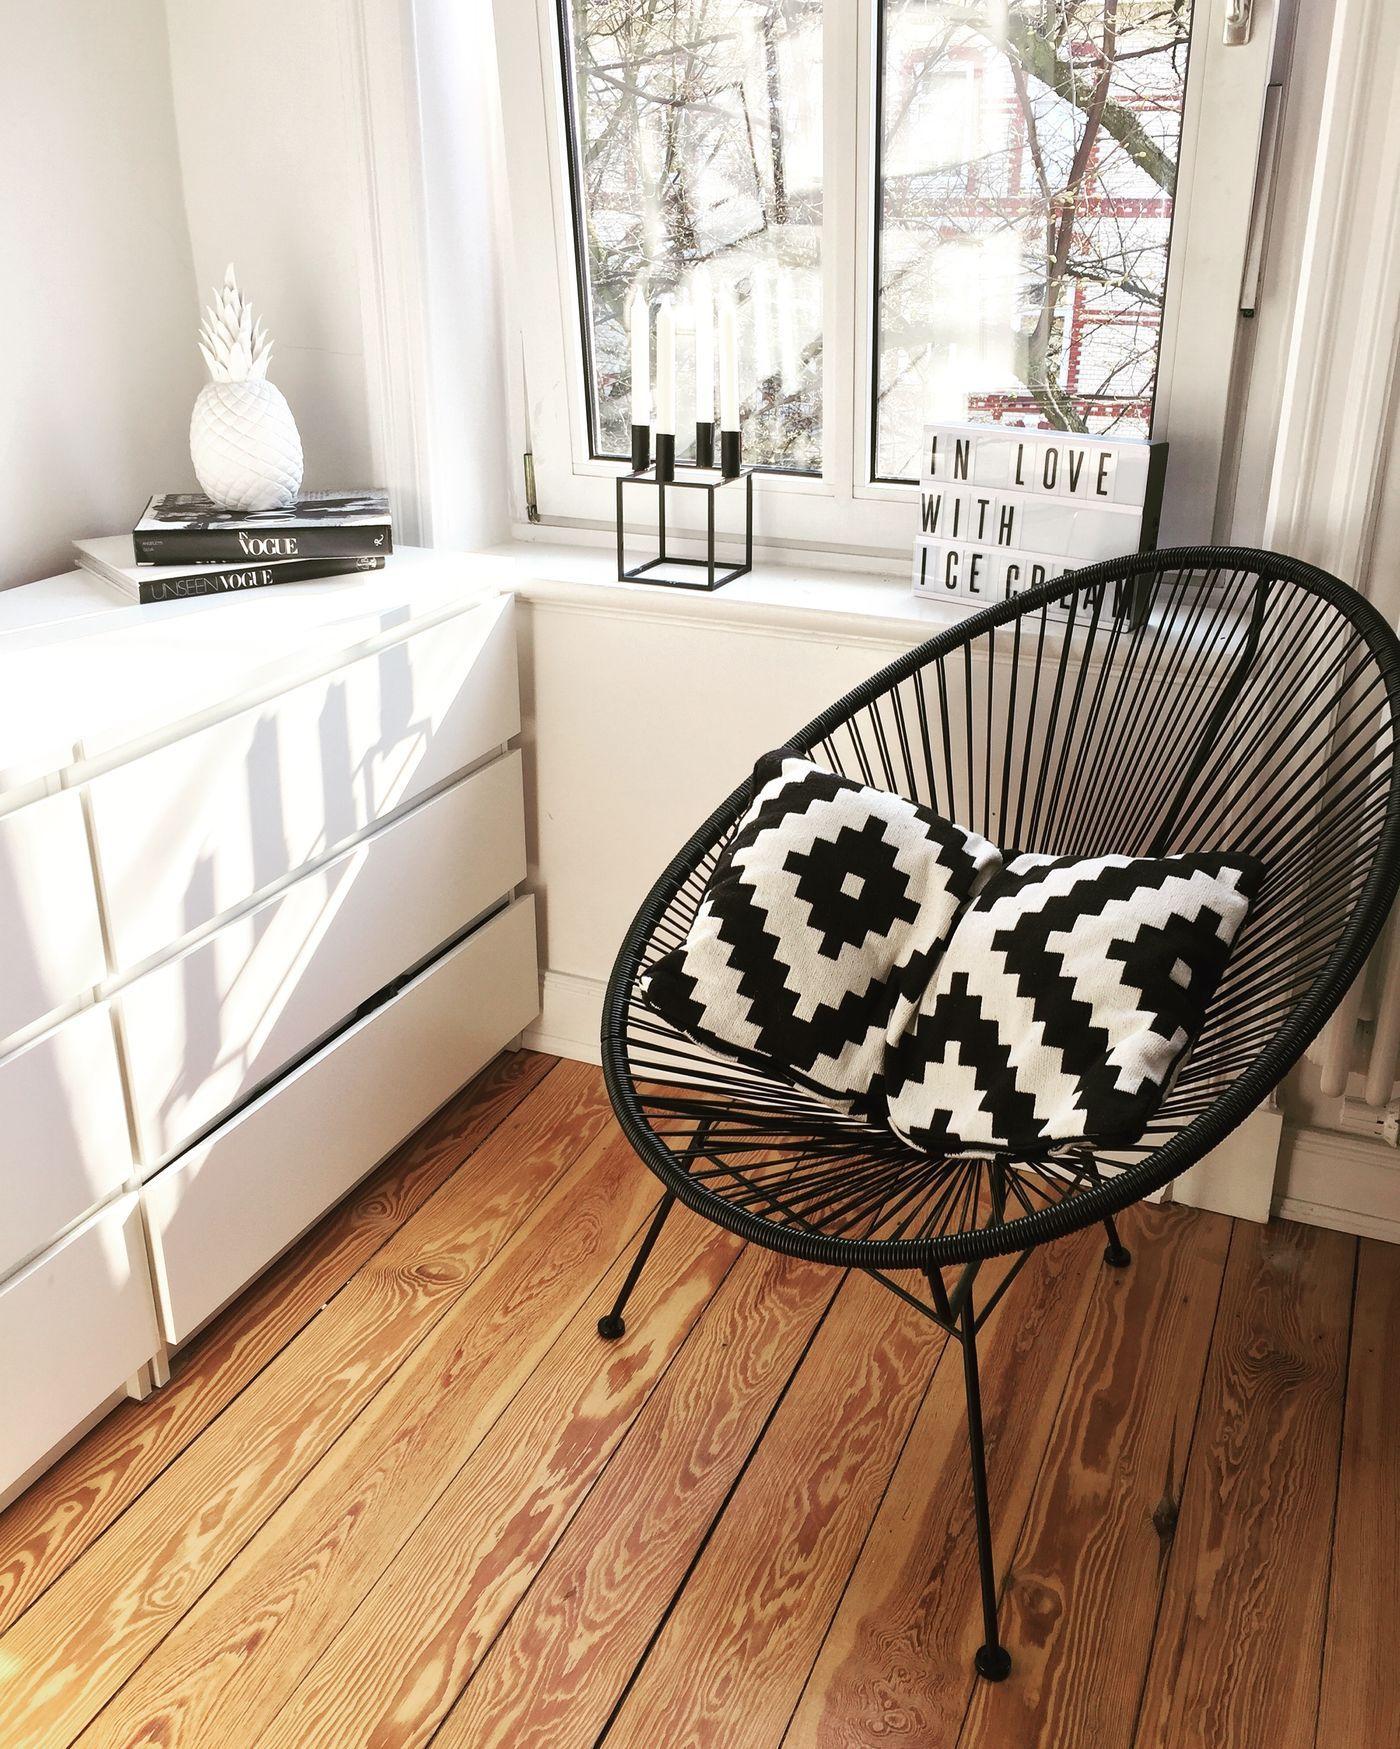 Ikea Malm Kommode. Wohnzimmerecke